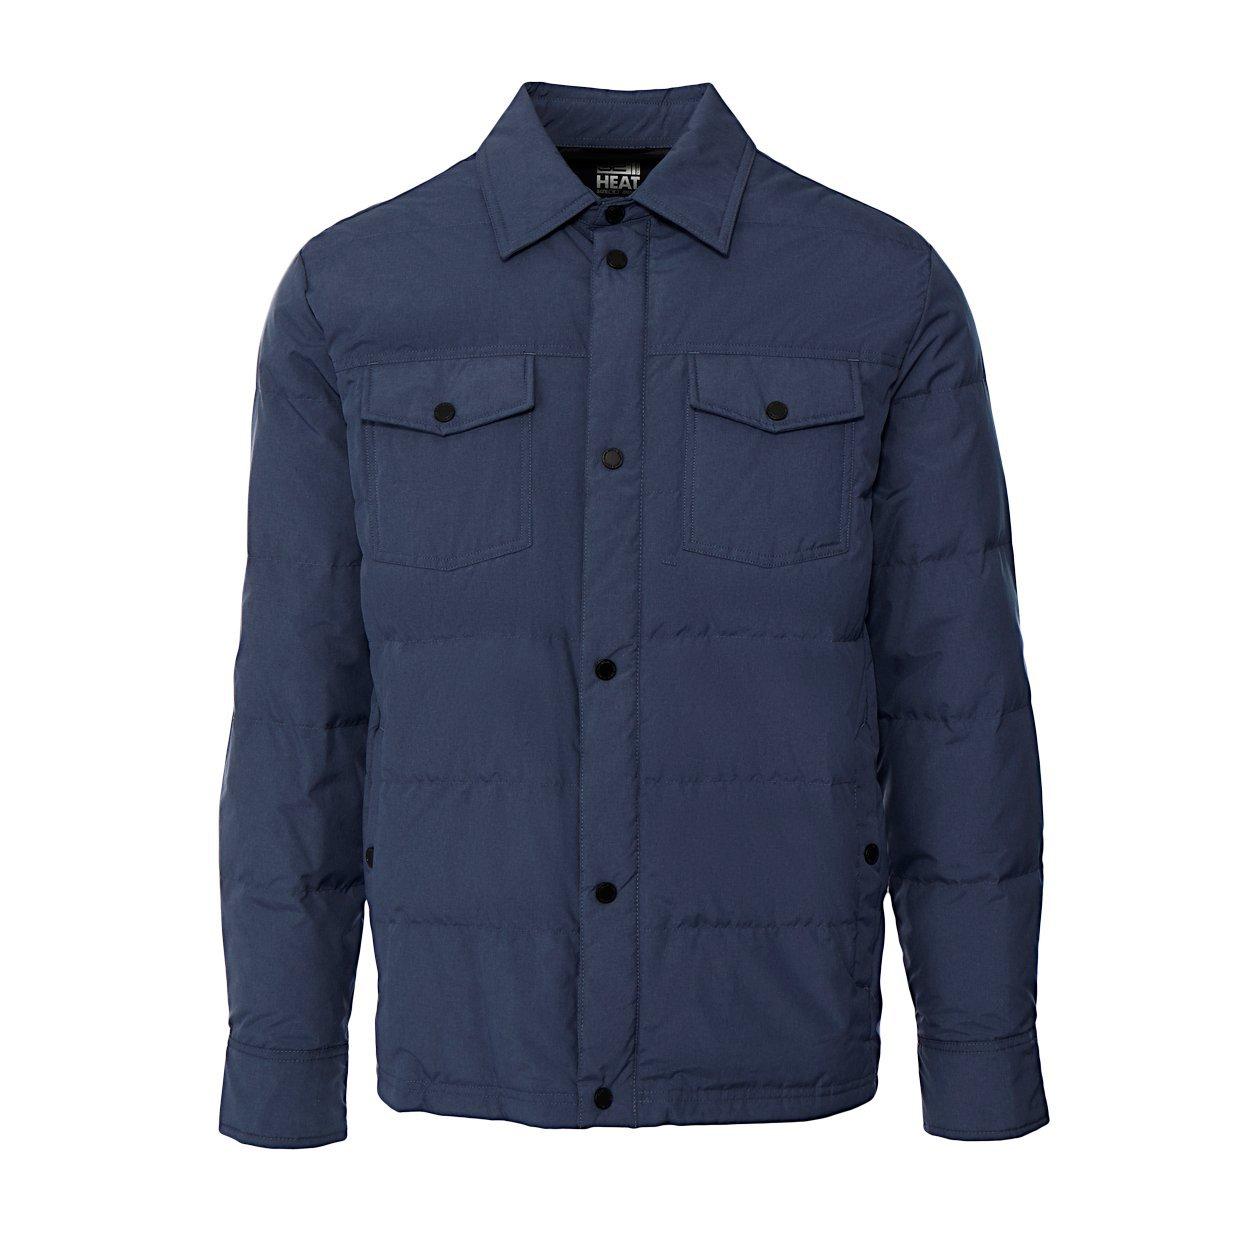 8d7dd6a6226 32 DEGREES Men s Packable Down Shirt Jacket at Amazon Men s Clothing store